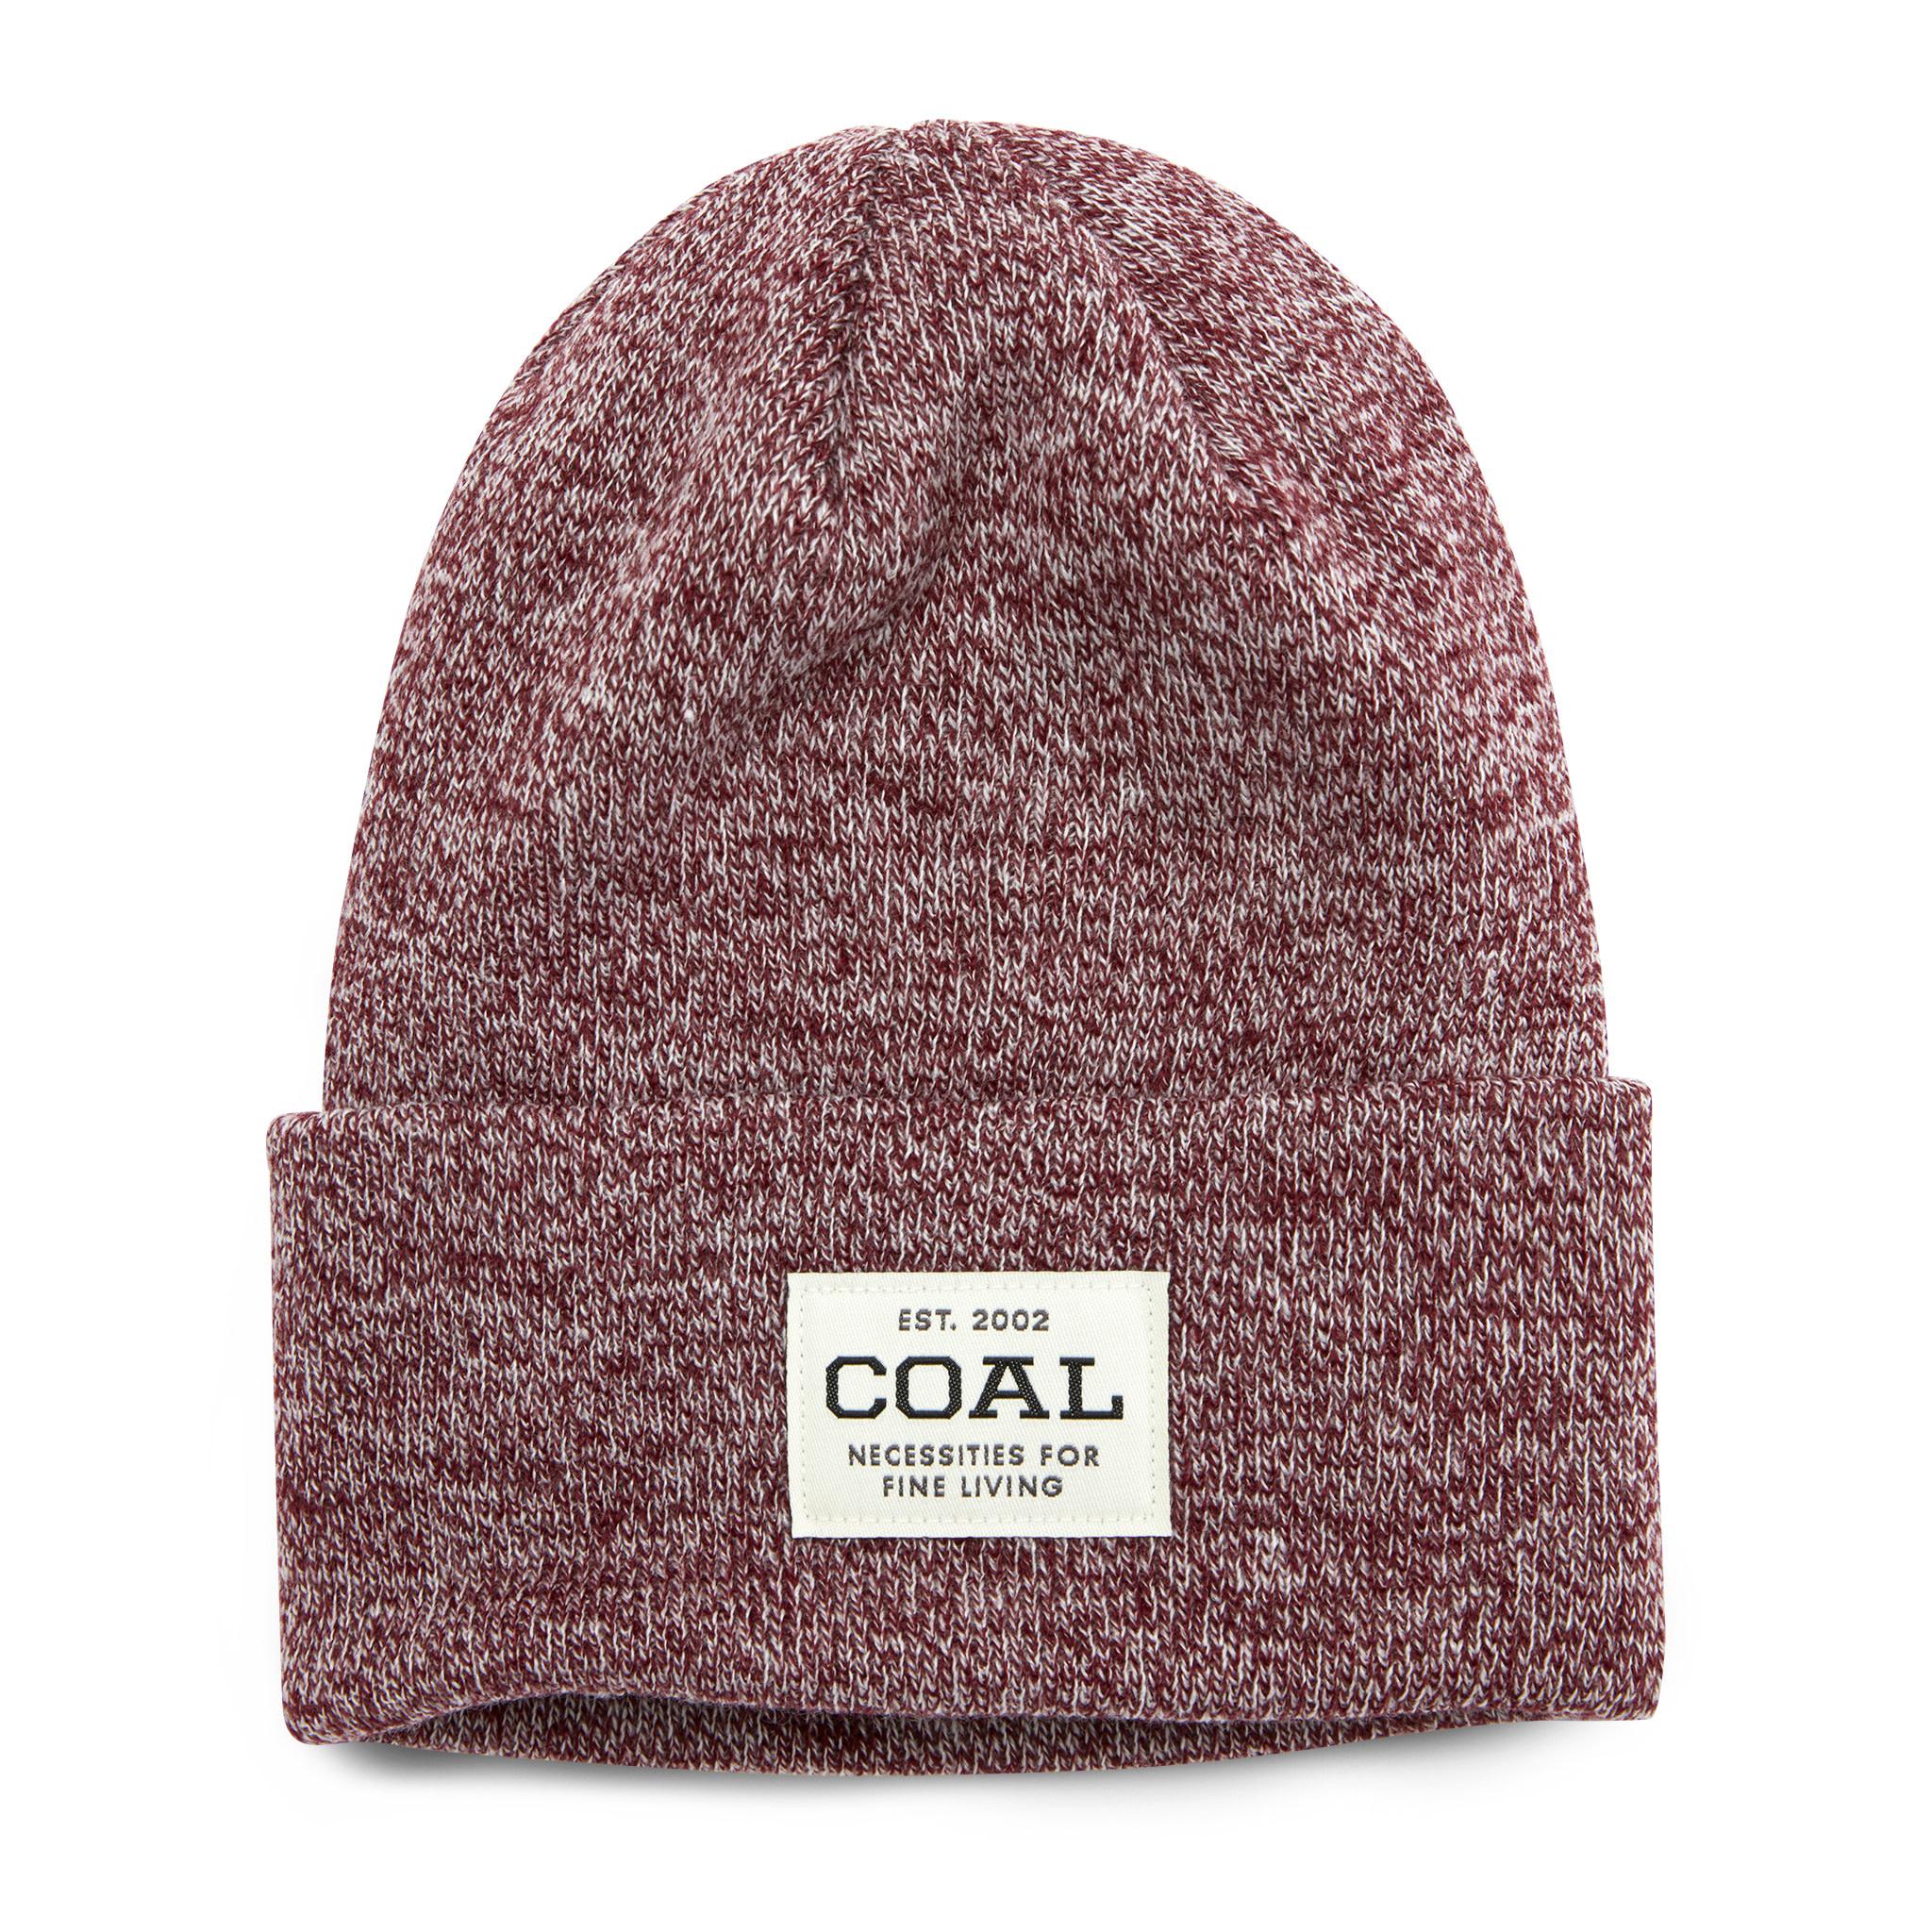 Coal Coal The Uniform - Burgundy Marl